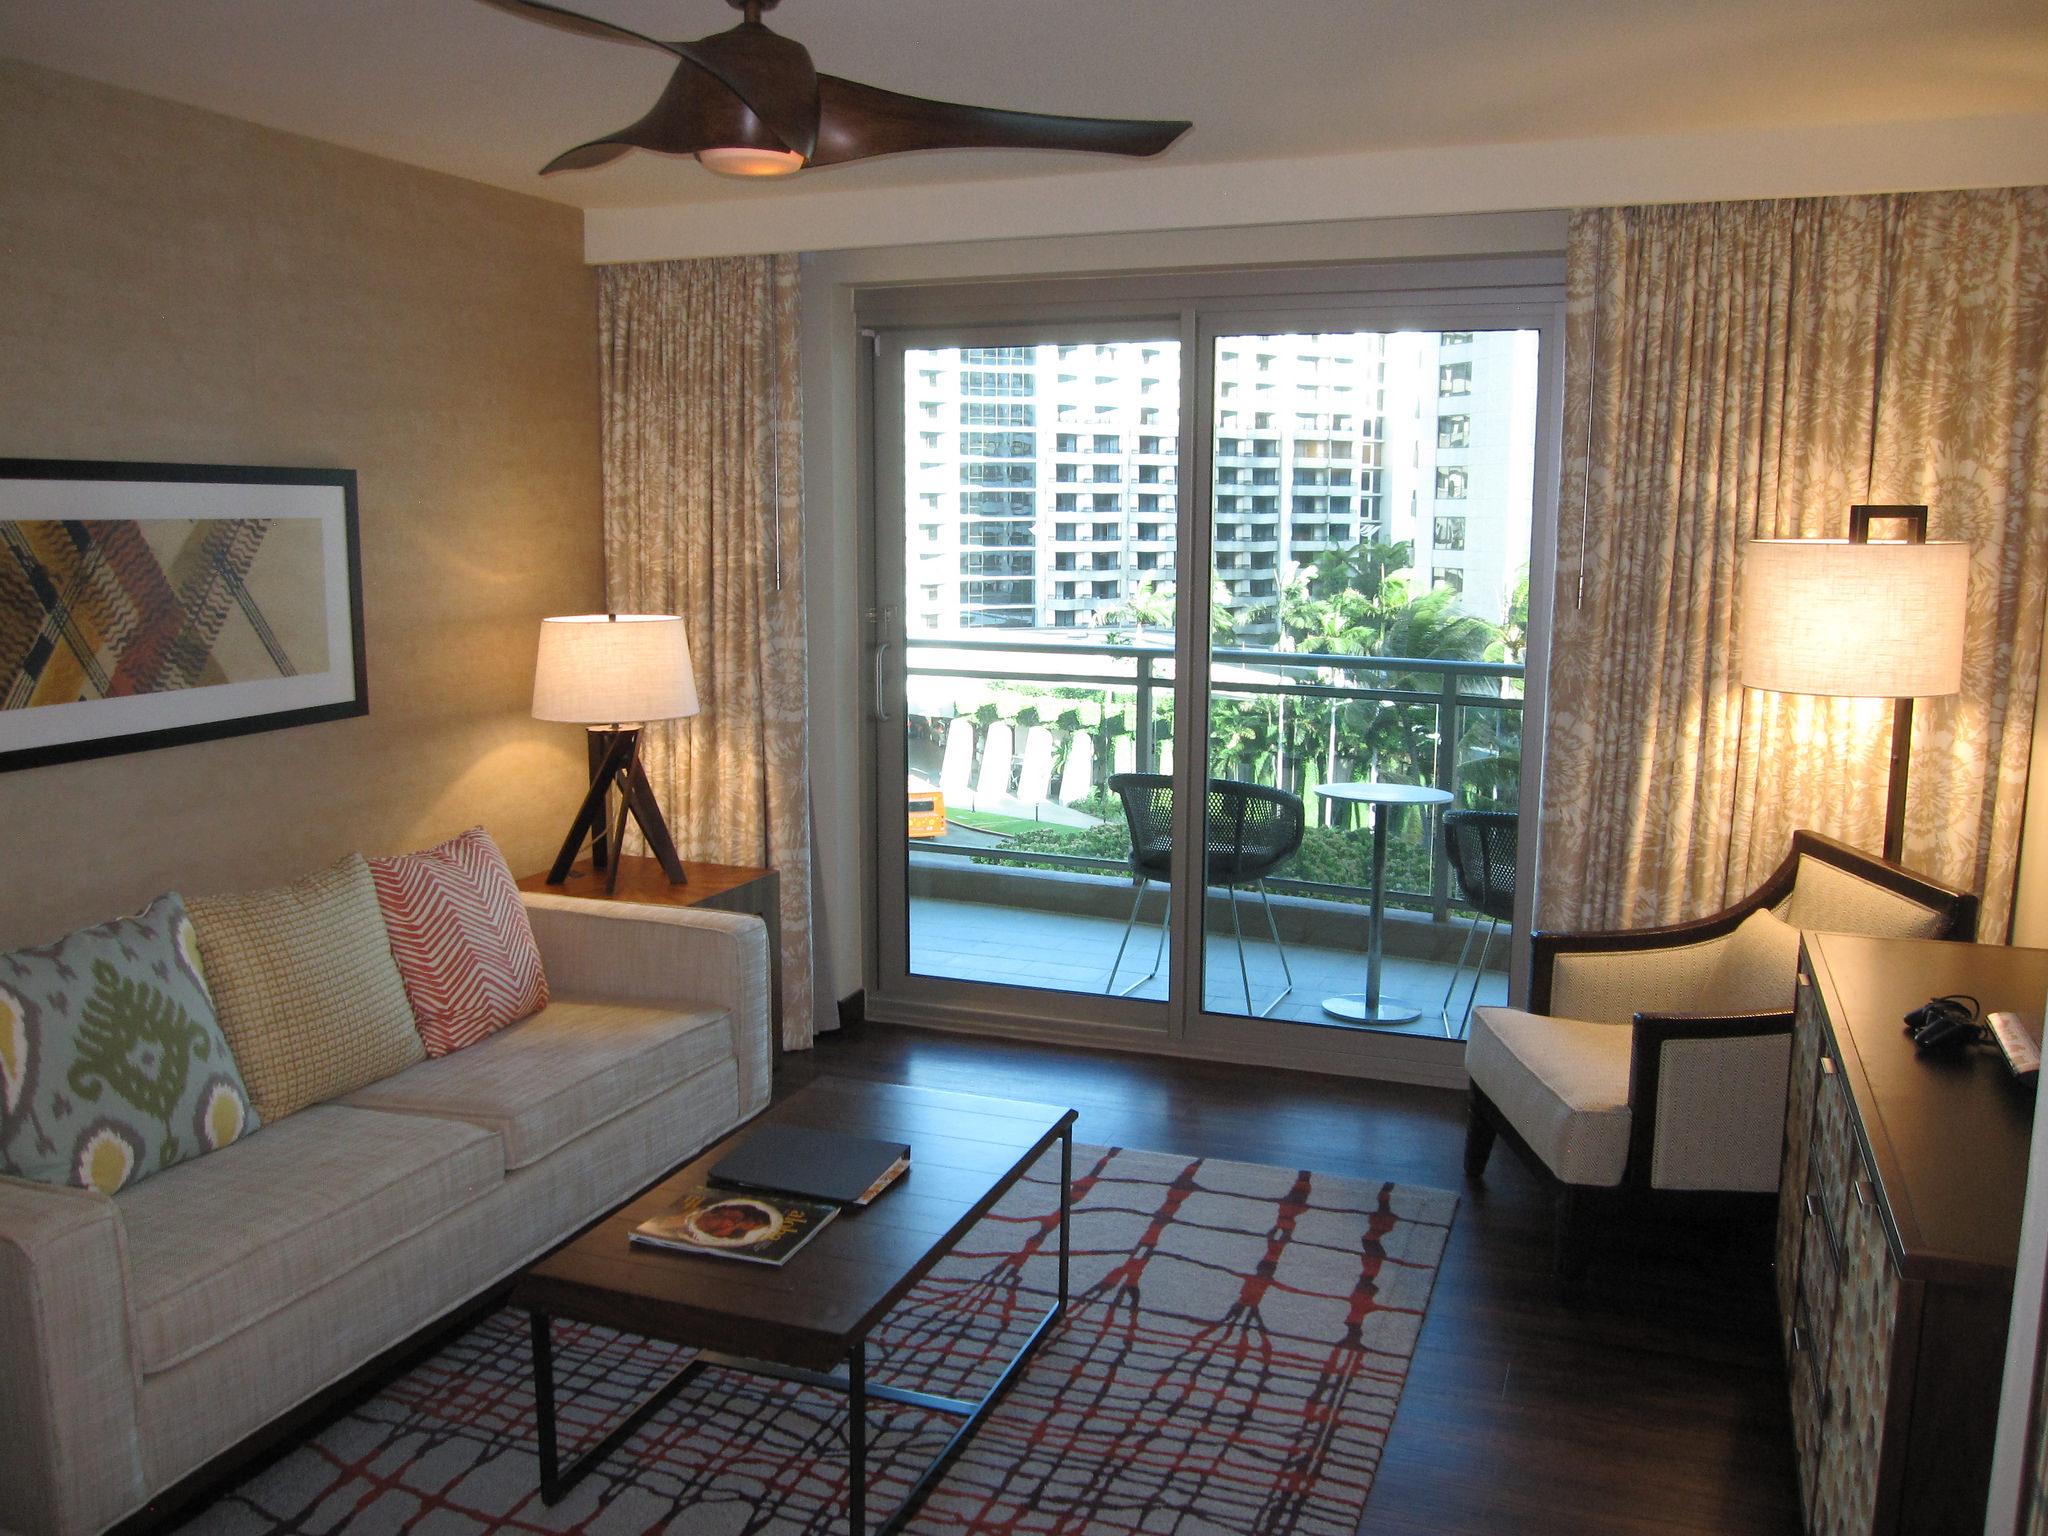 Hilton Grand Vacations Club Grand Islander image